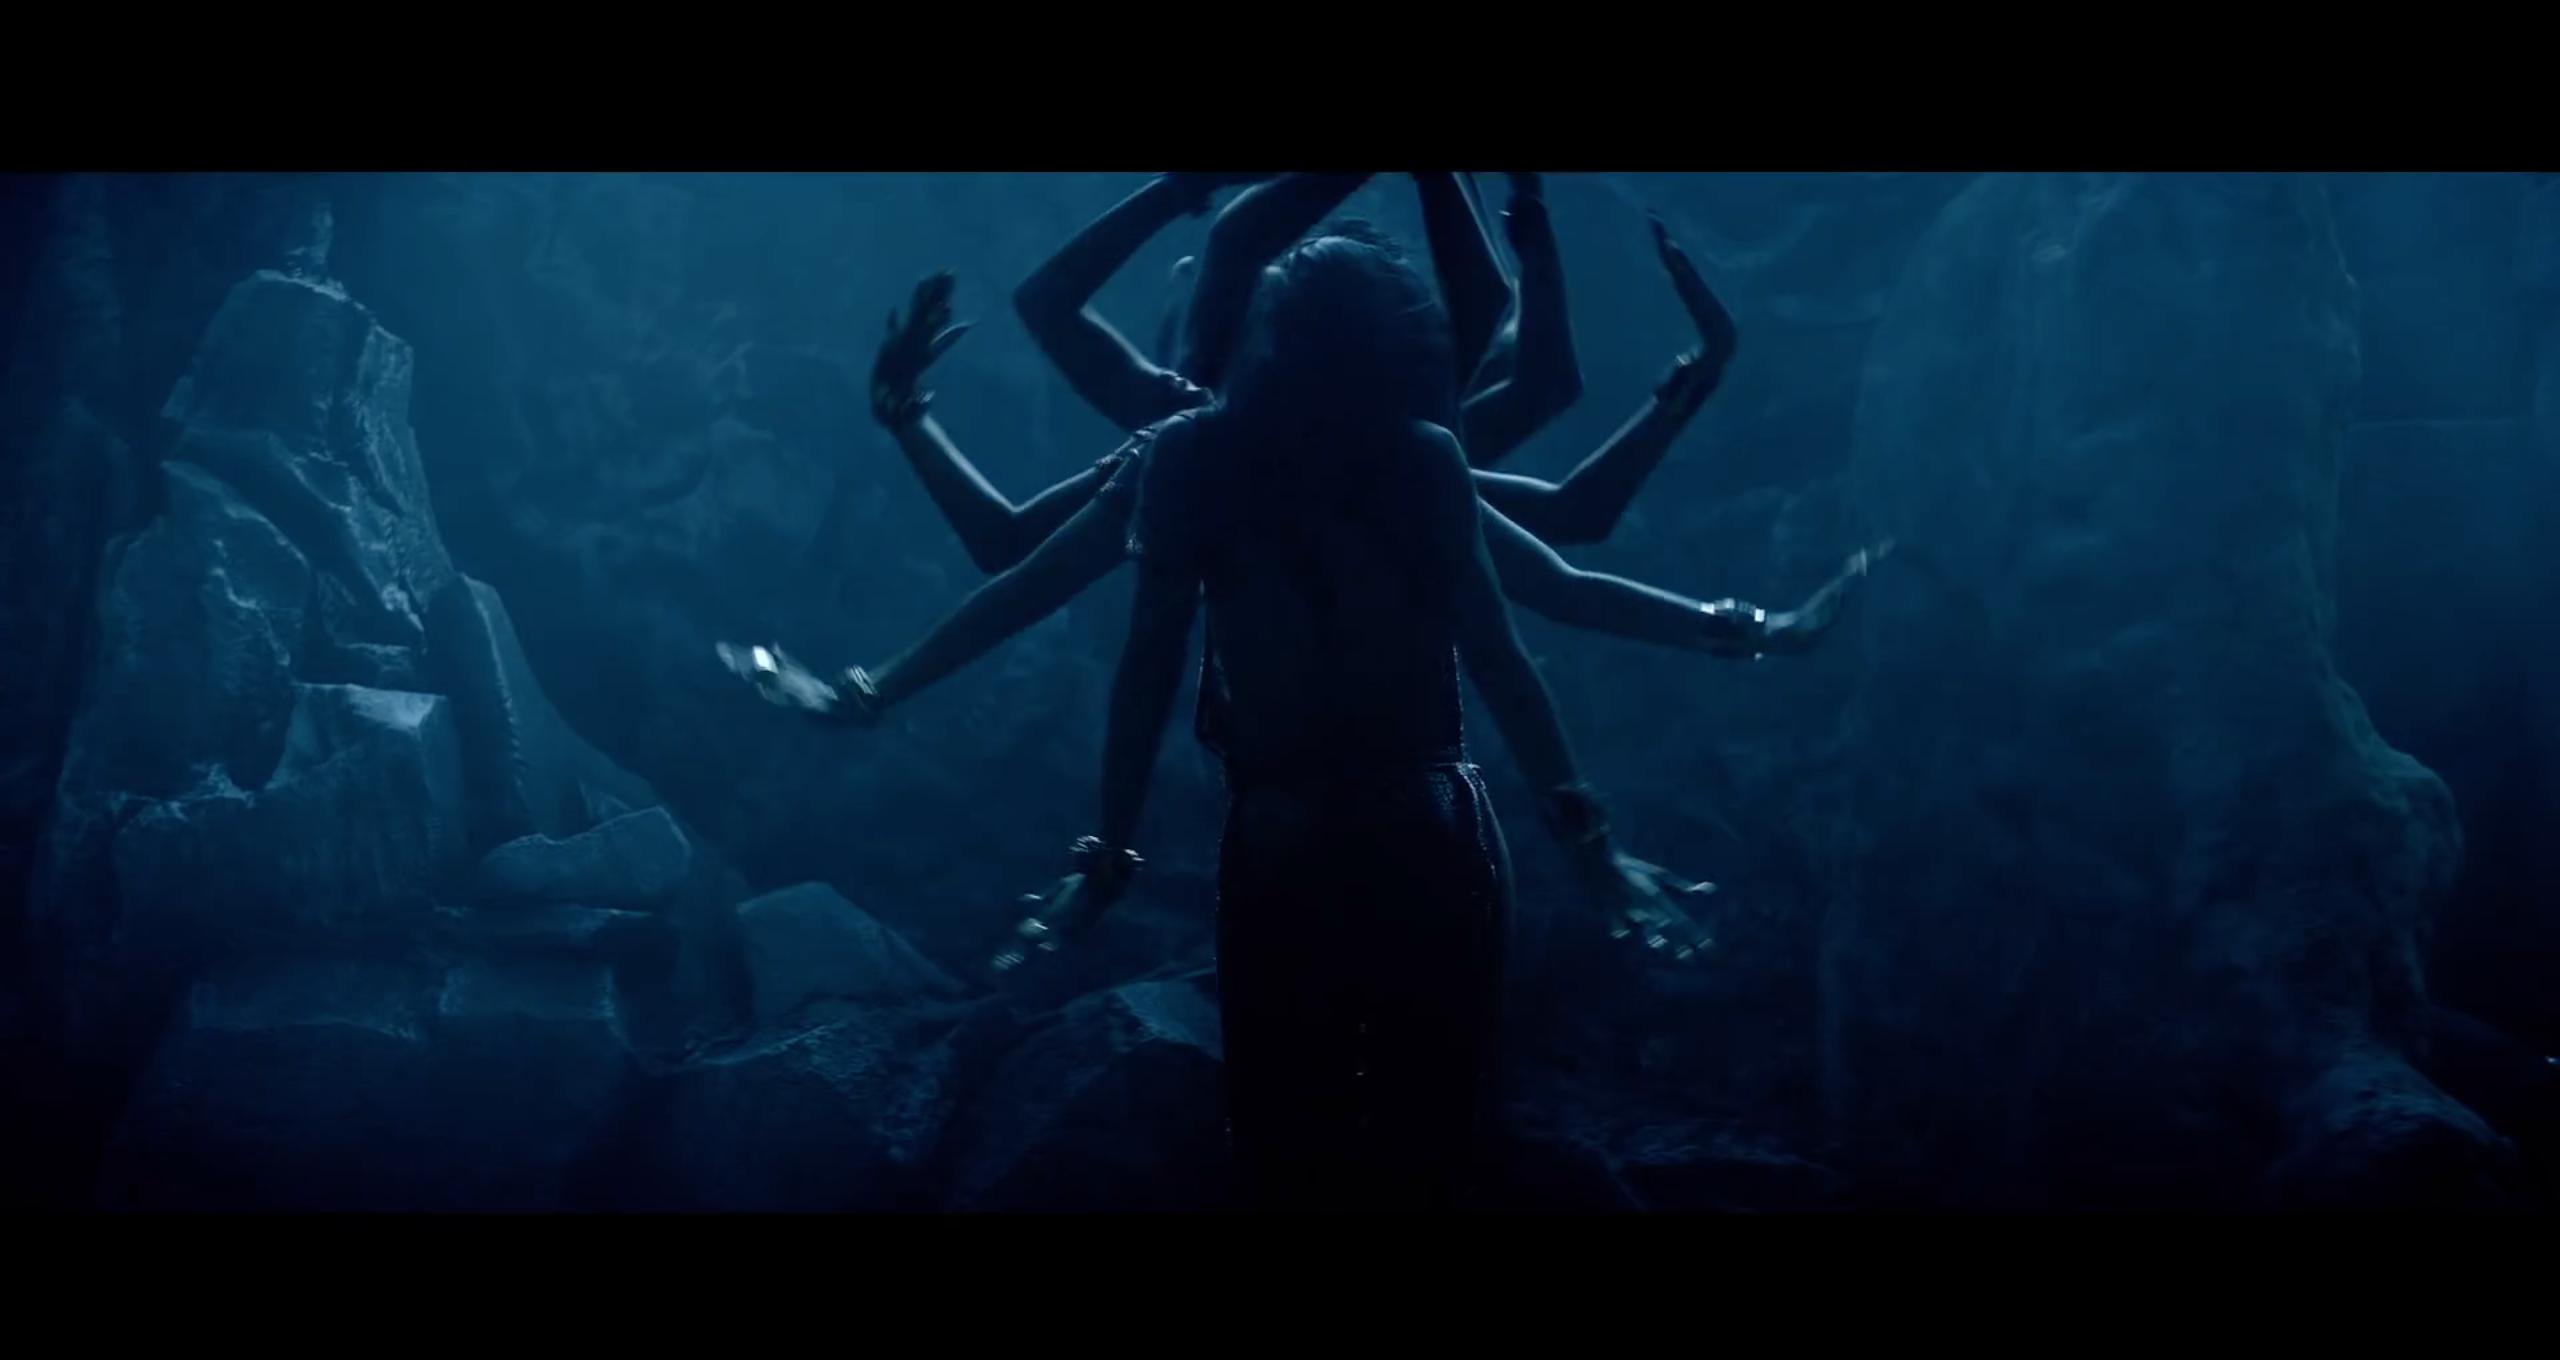 Rihanna / Where Have You Been / Music Video Still / Durga Goddess / Multiple Arms